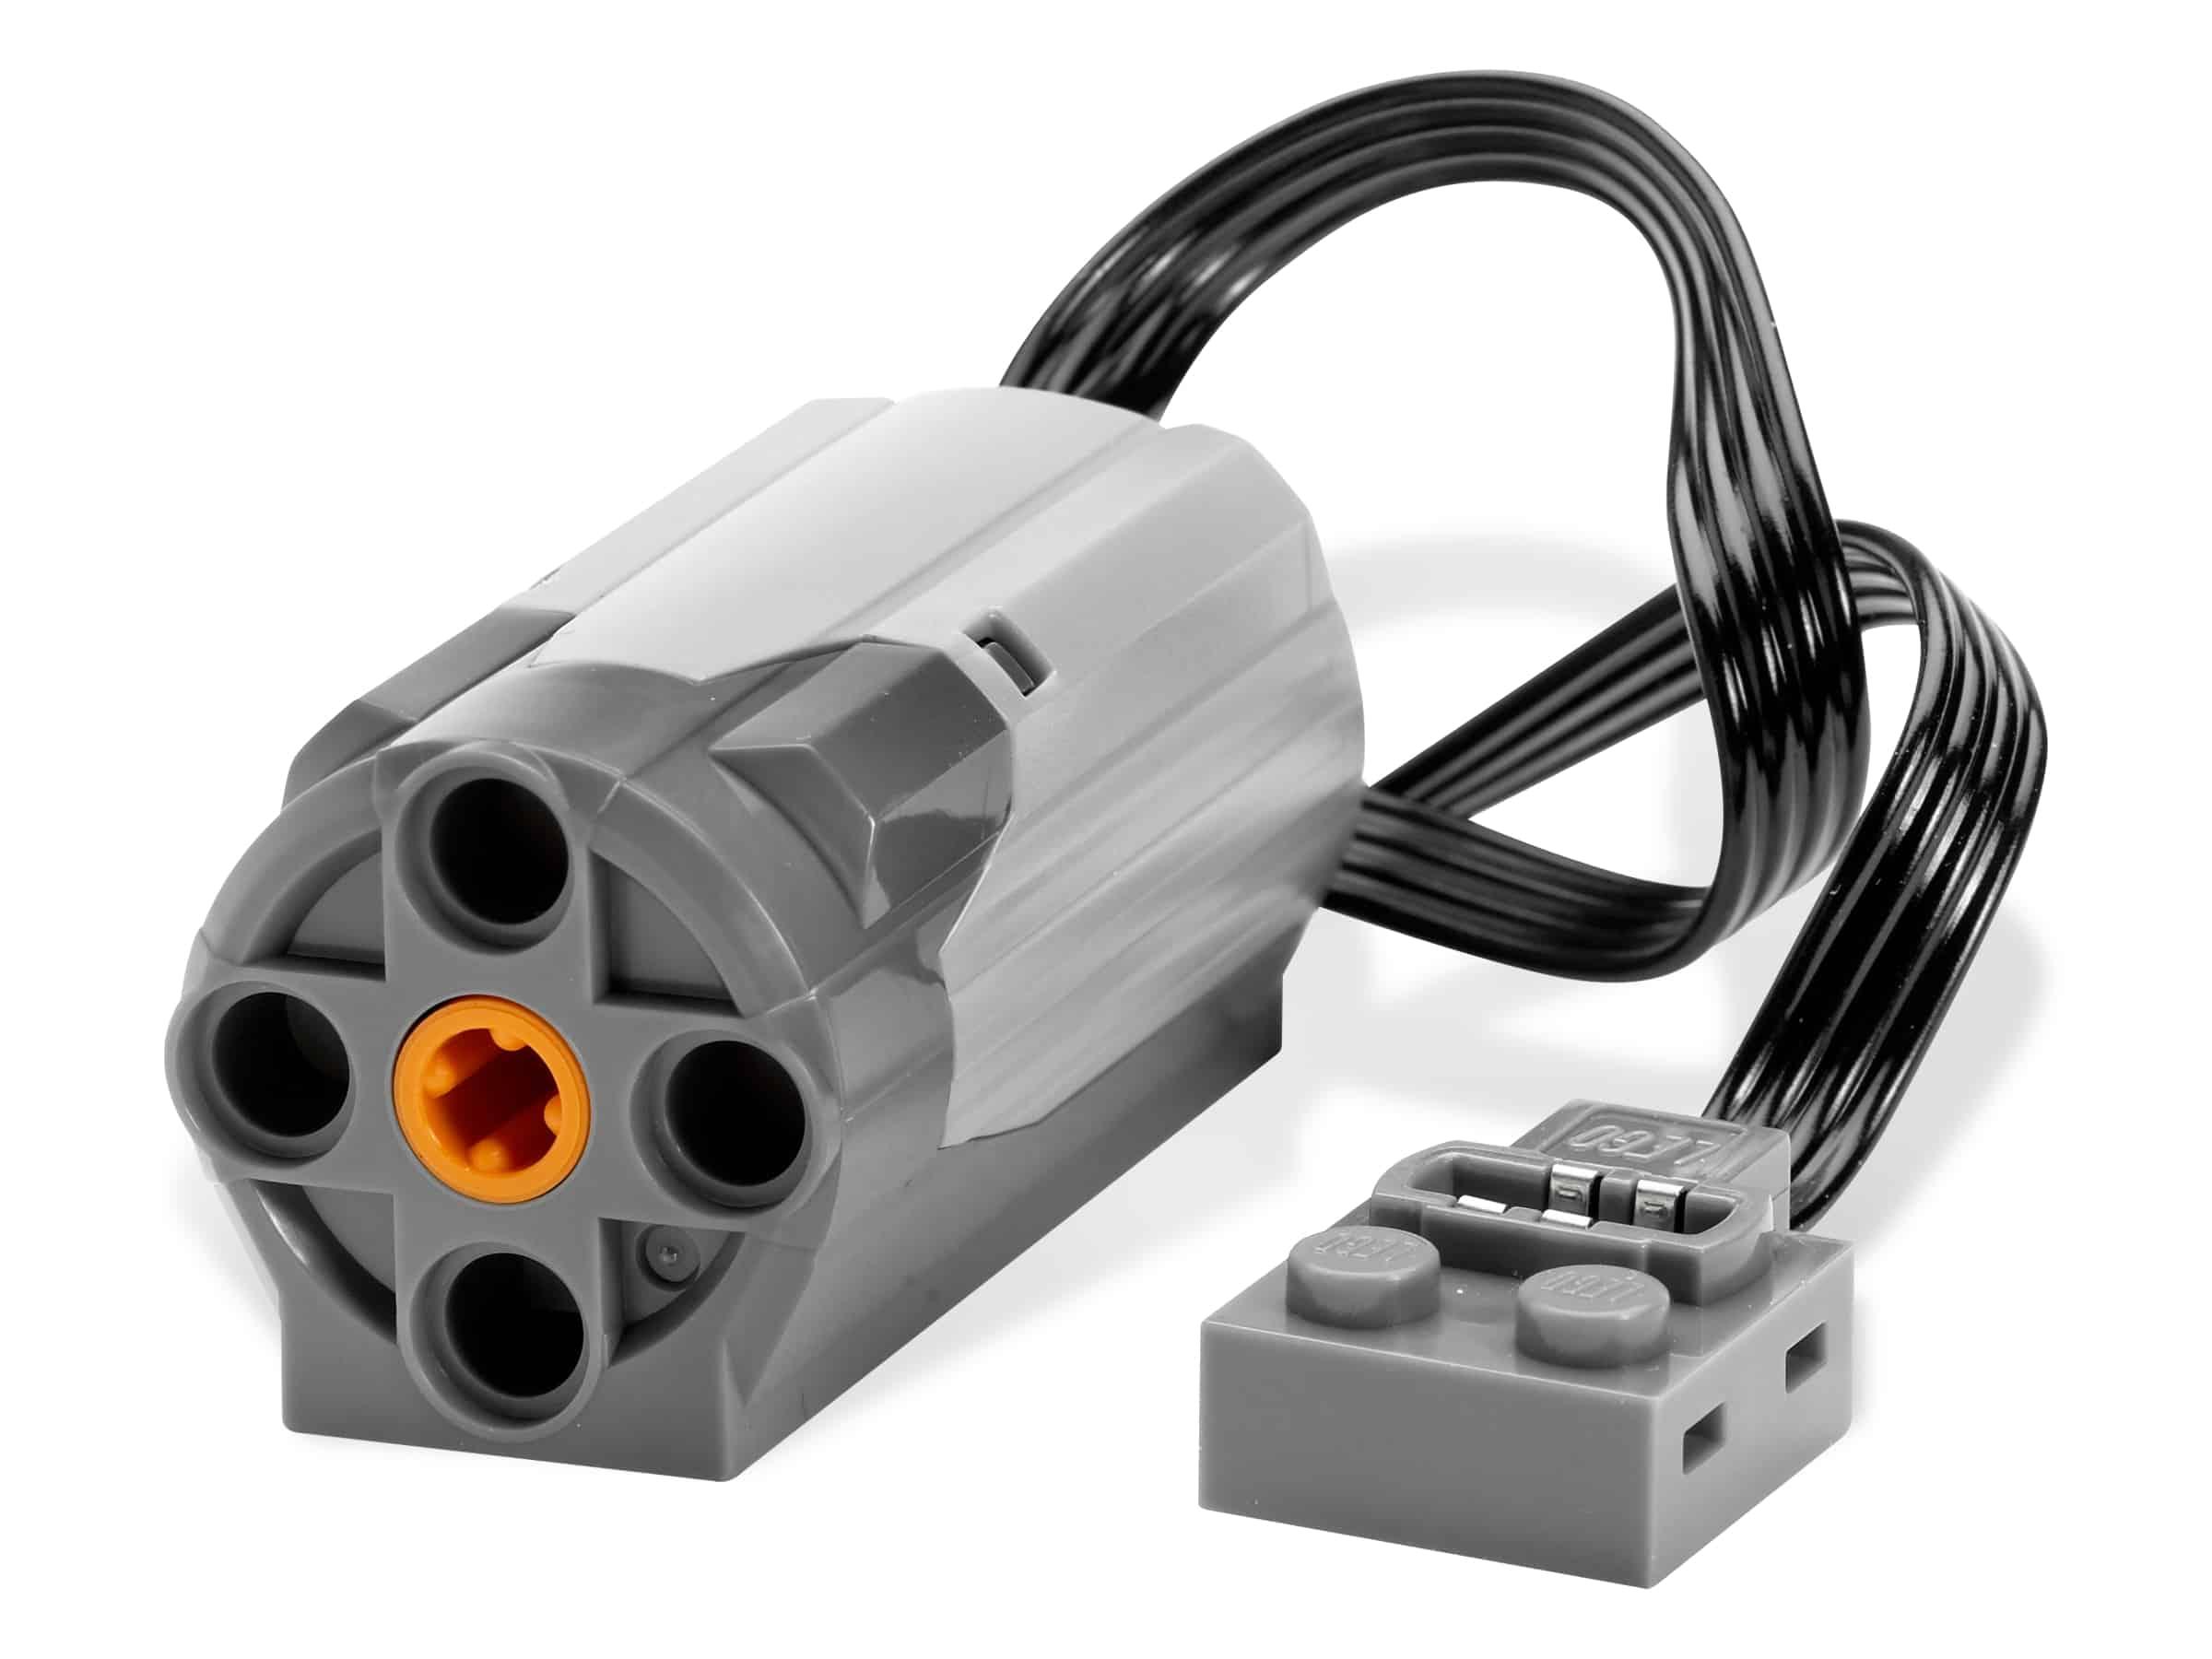 lego 8883 silnik m power functions